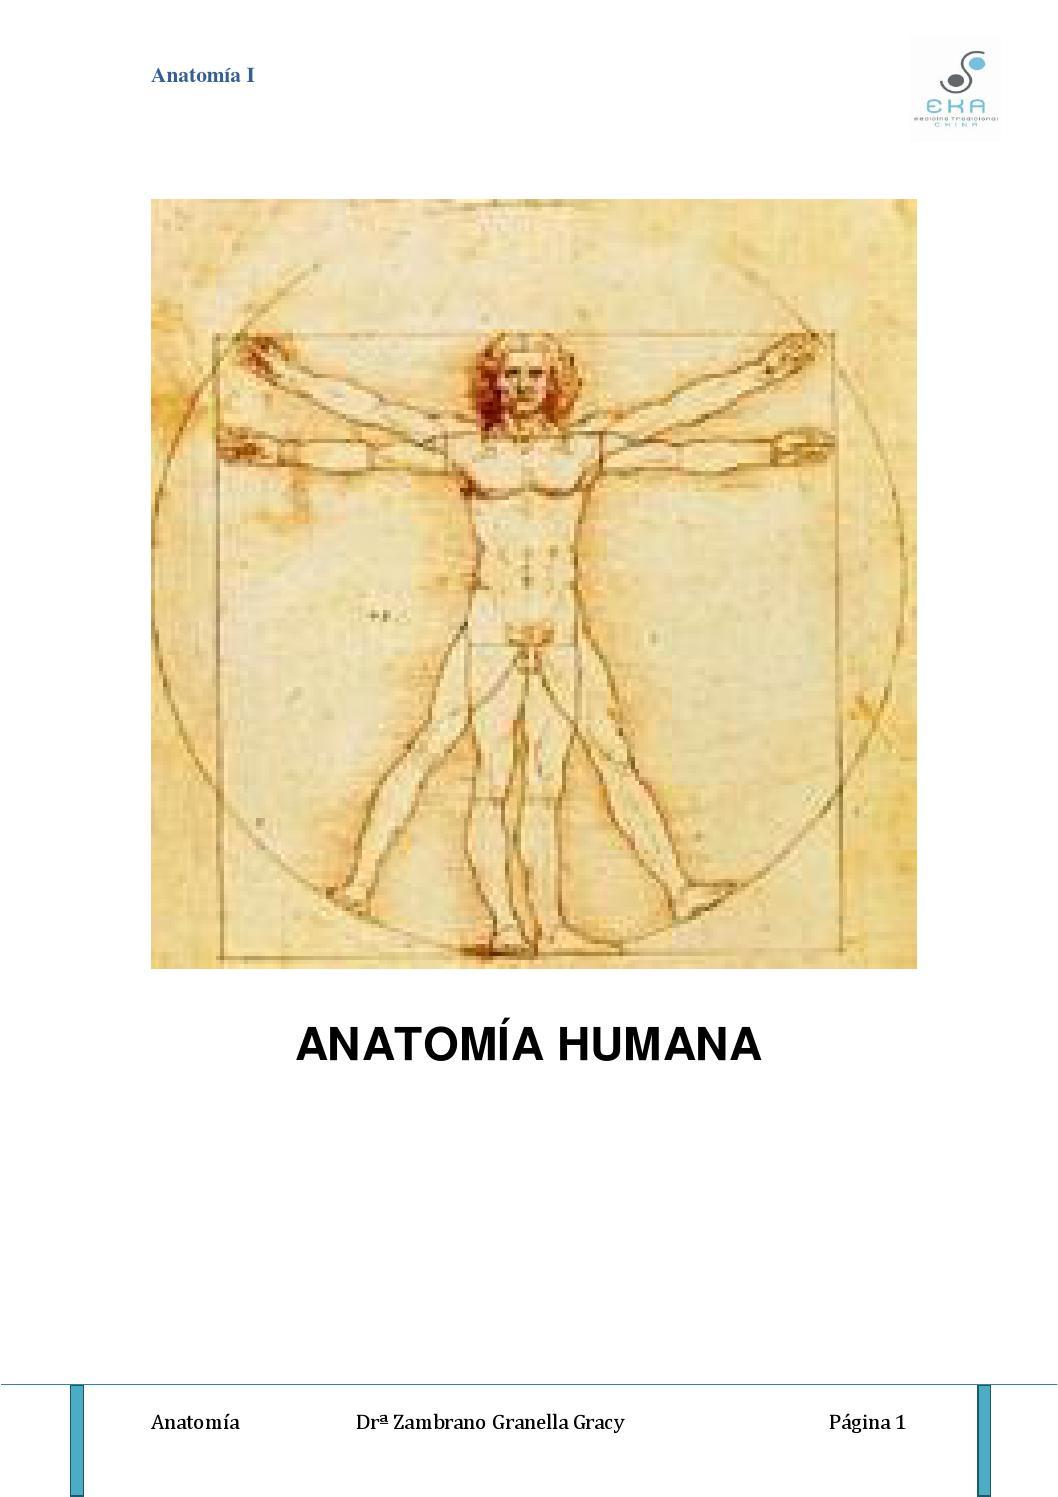 Anatomia de gracy by Eka Terapias - issuu